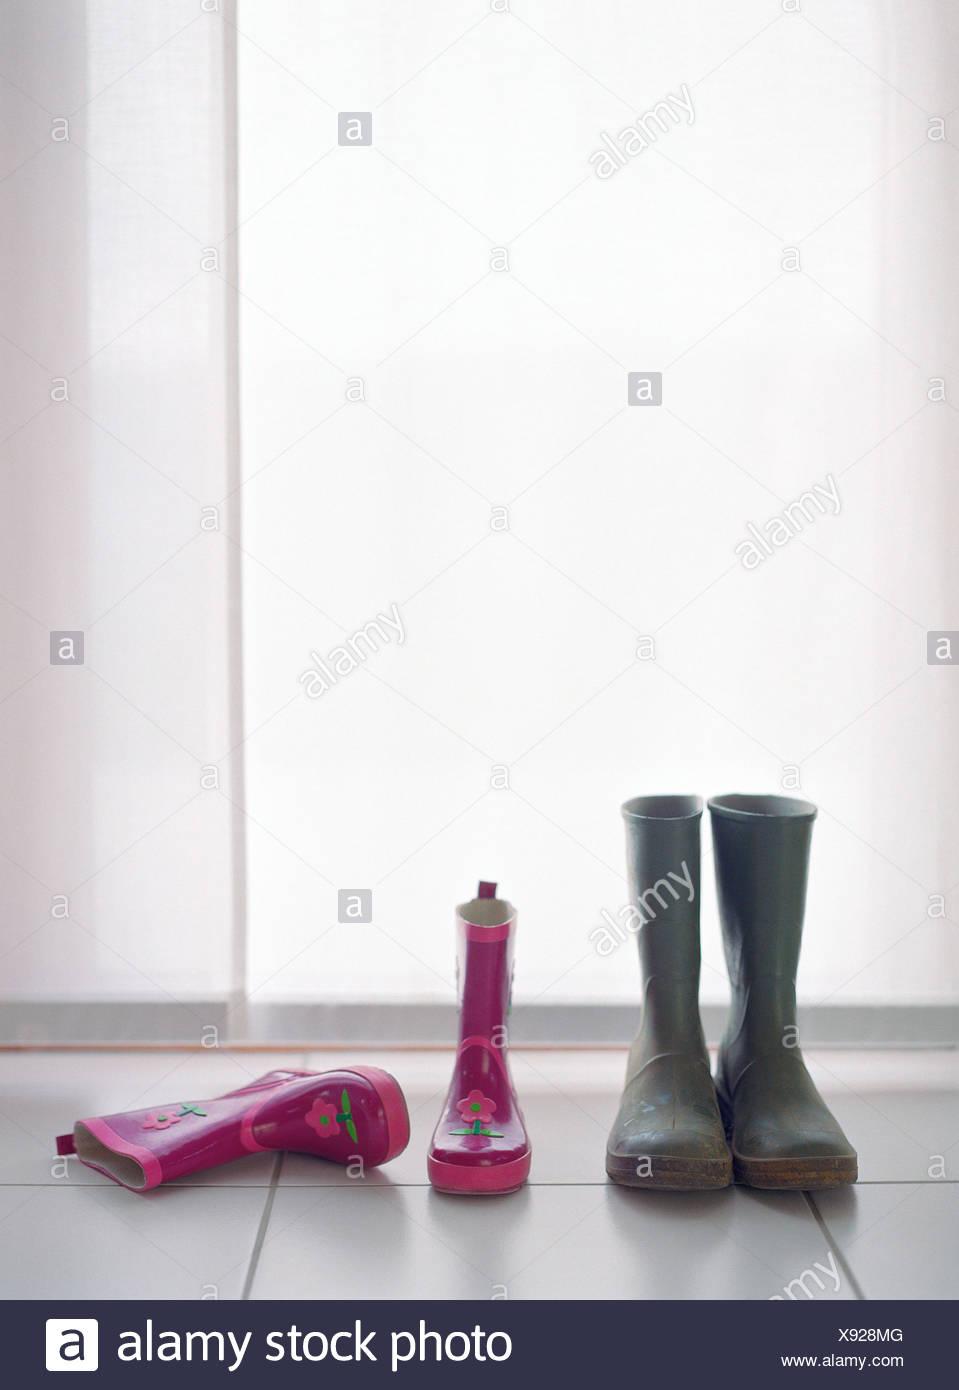 Weiße Stiefel Stockfotos & Weiße Stiefel Bilder Alamy